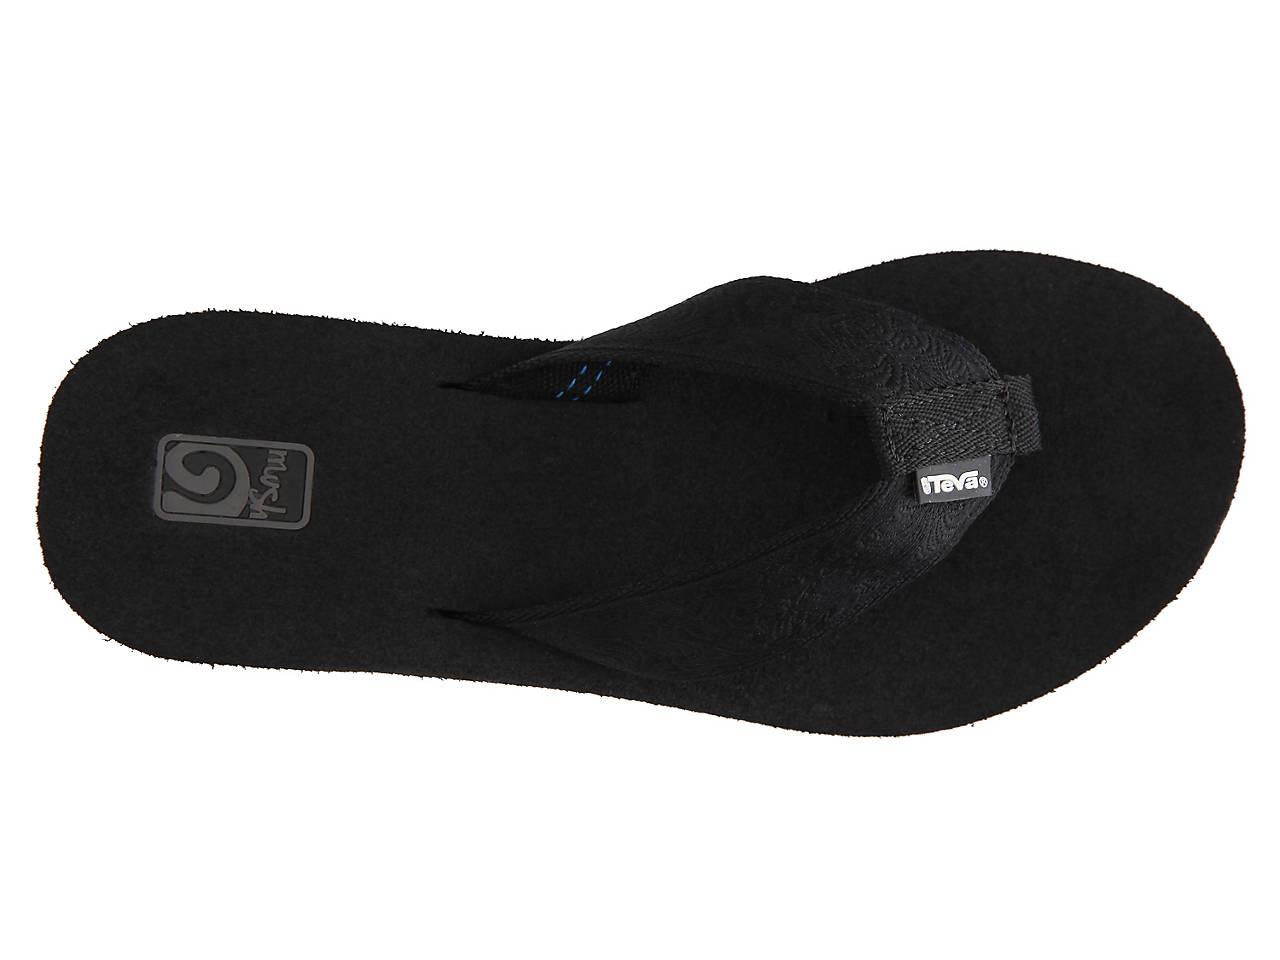 64e8bc8d6cca Teva New Mandalyn Wedge Sandal Women s Shoes